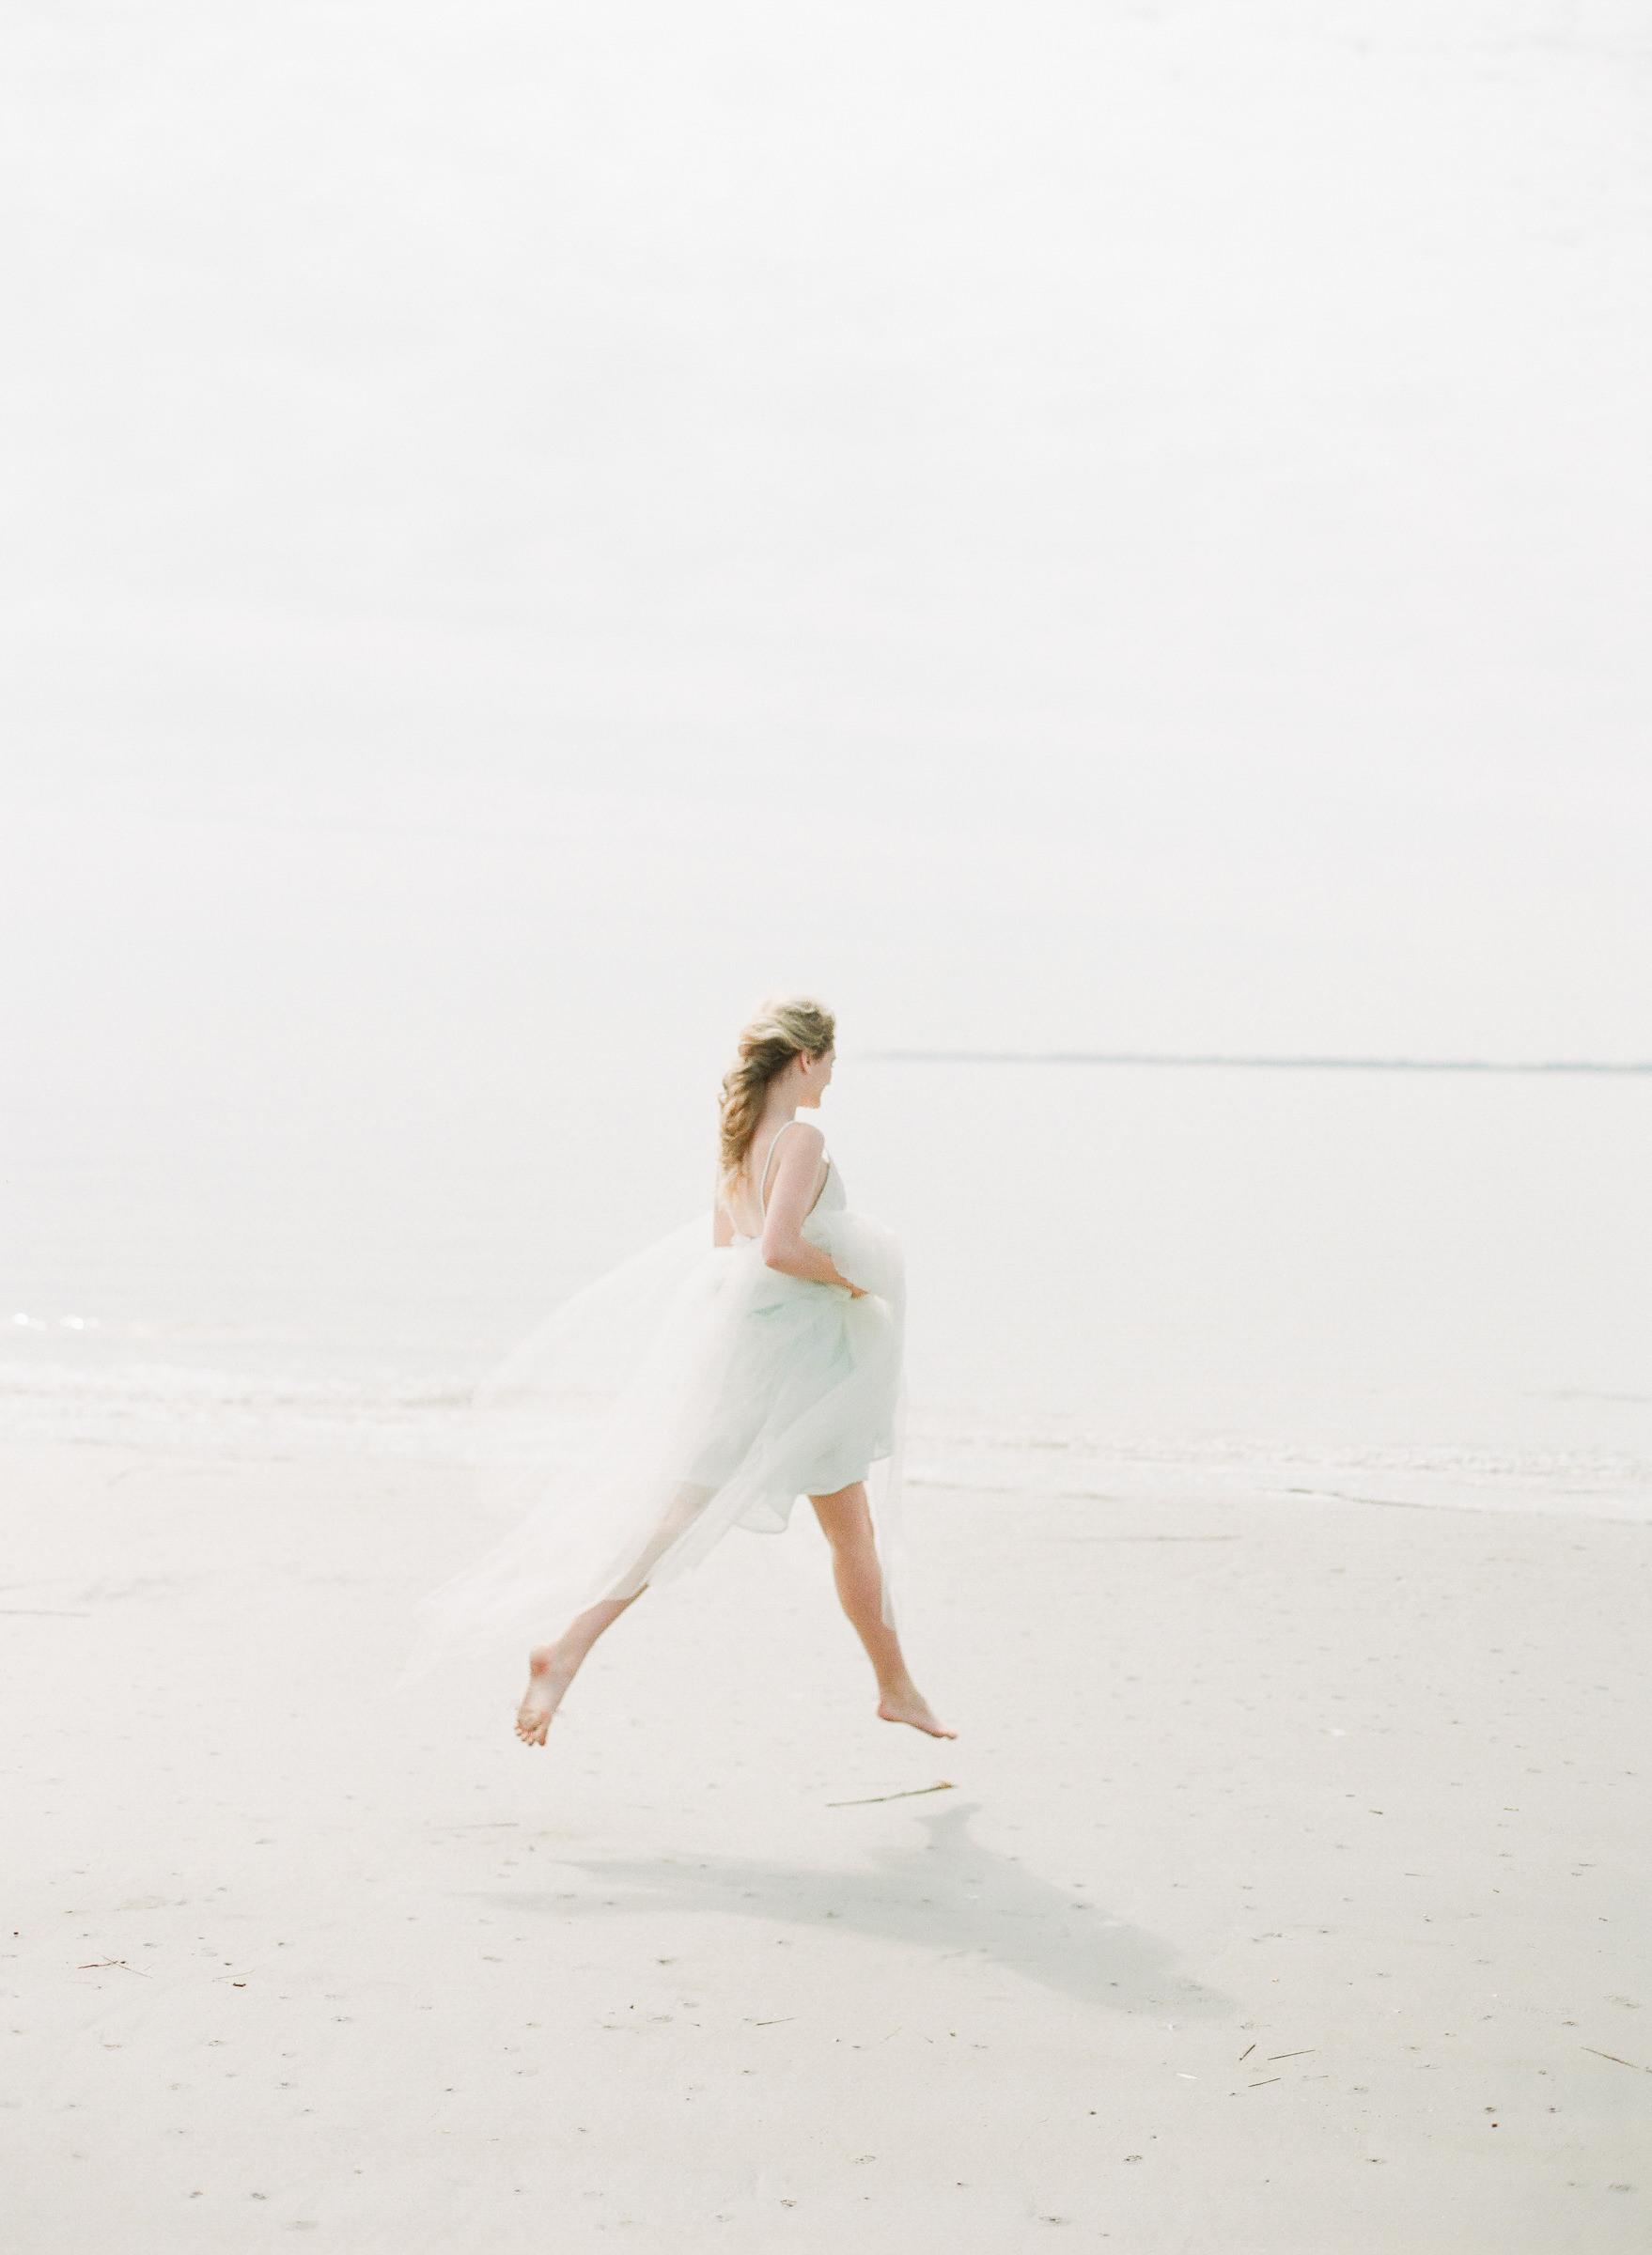 Ethereal photo of bride running on beach - photo by Corbin Gurkin